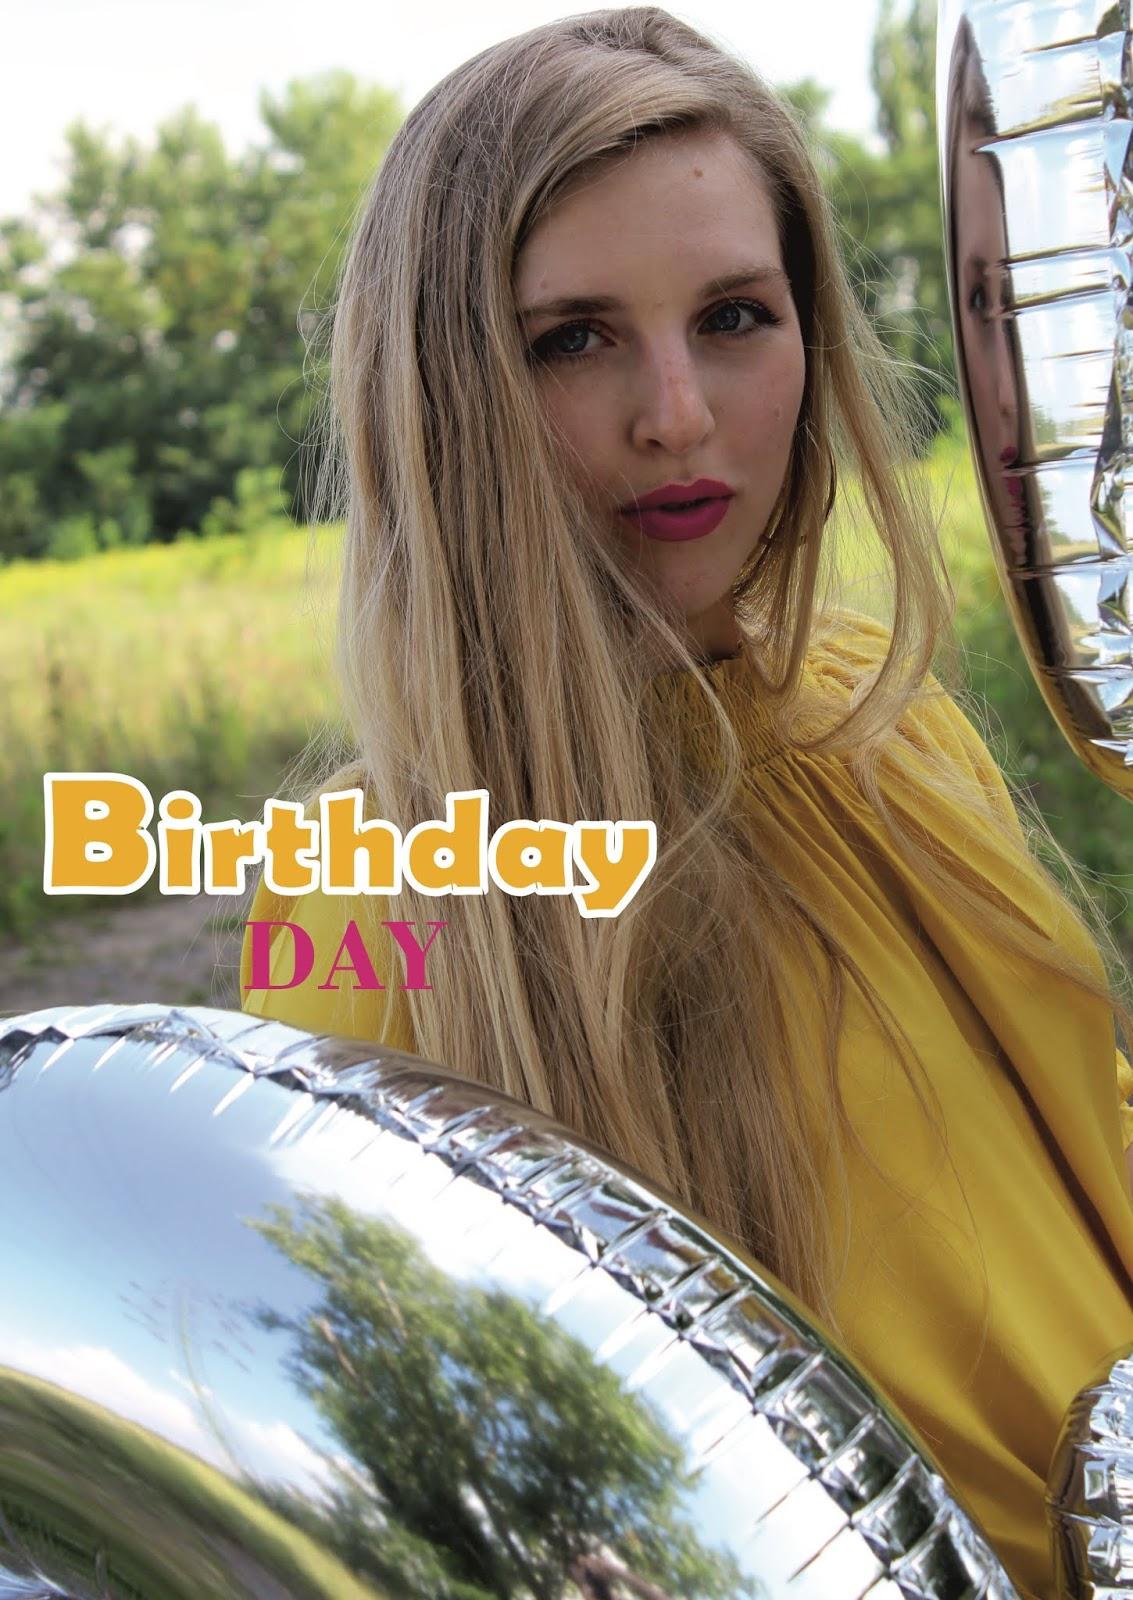 BIRTHDAY DAY